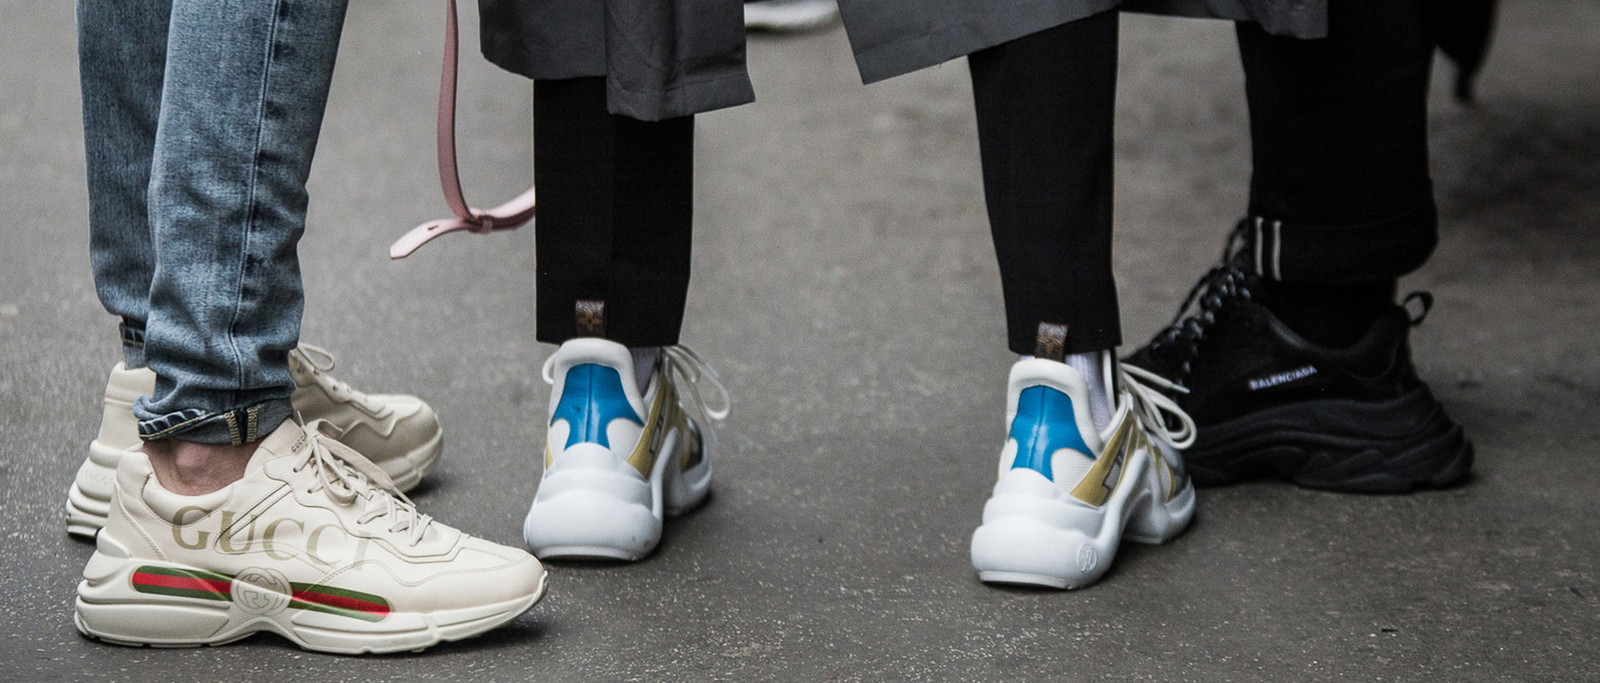 Chunky Sneakers Trend 2018 Balenciaga Triple S